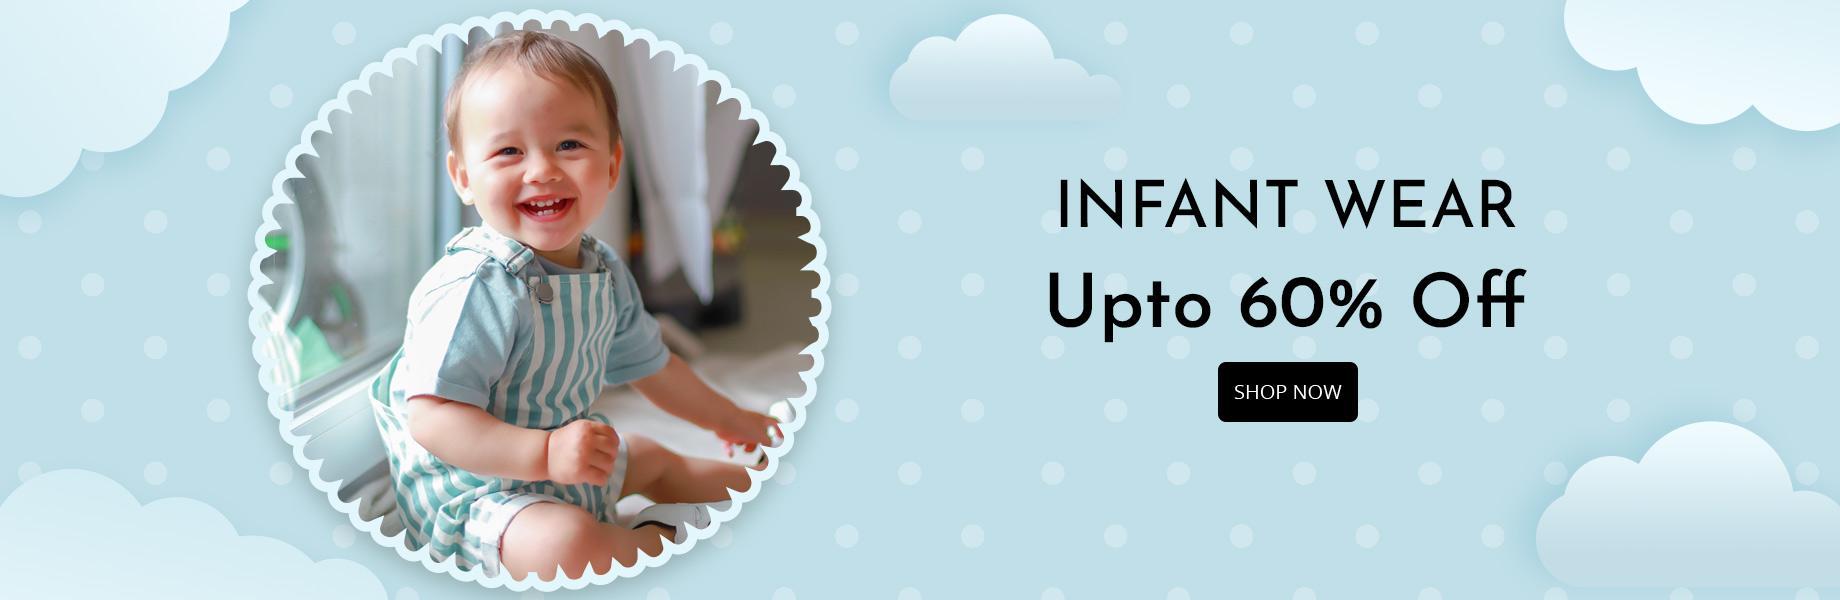 Kids-Page-Carousals-Infant-Wear-Web.jpg